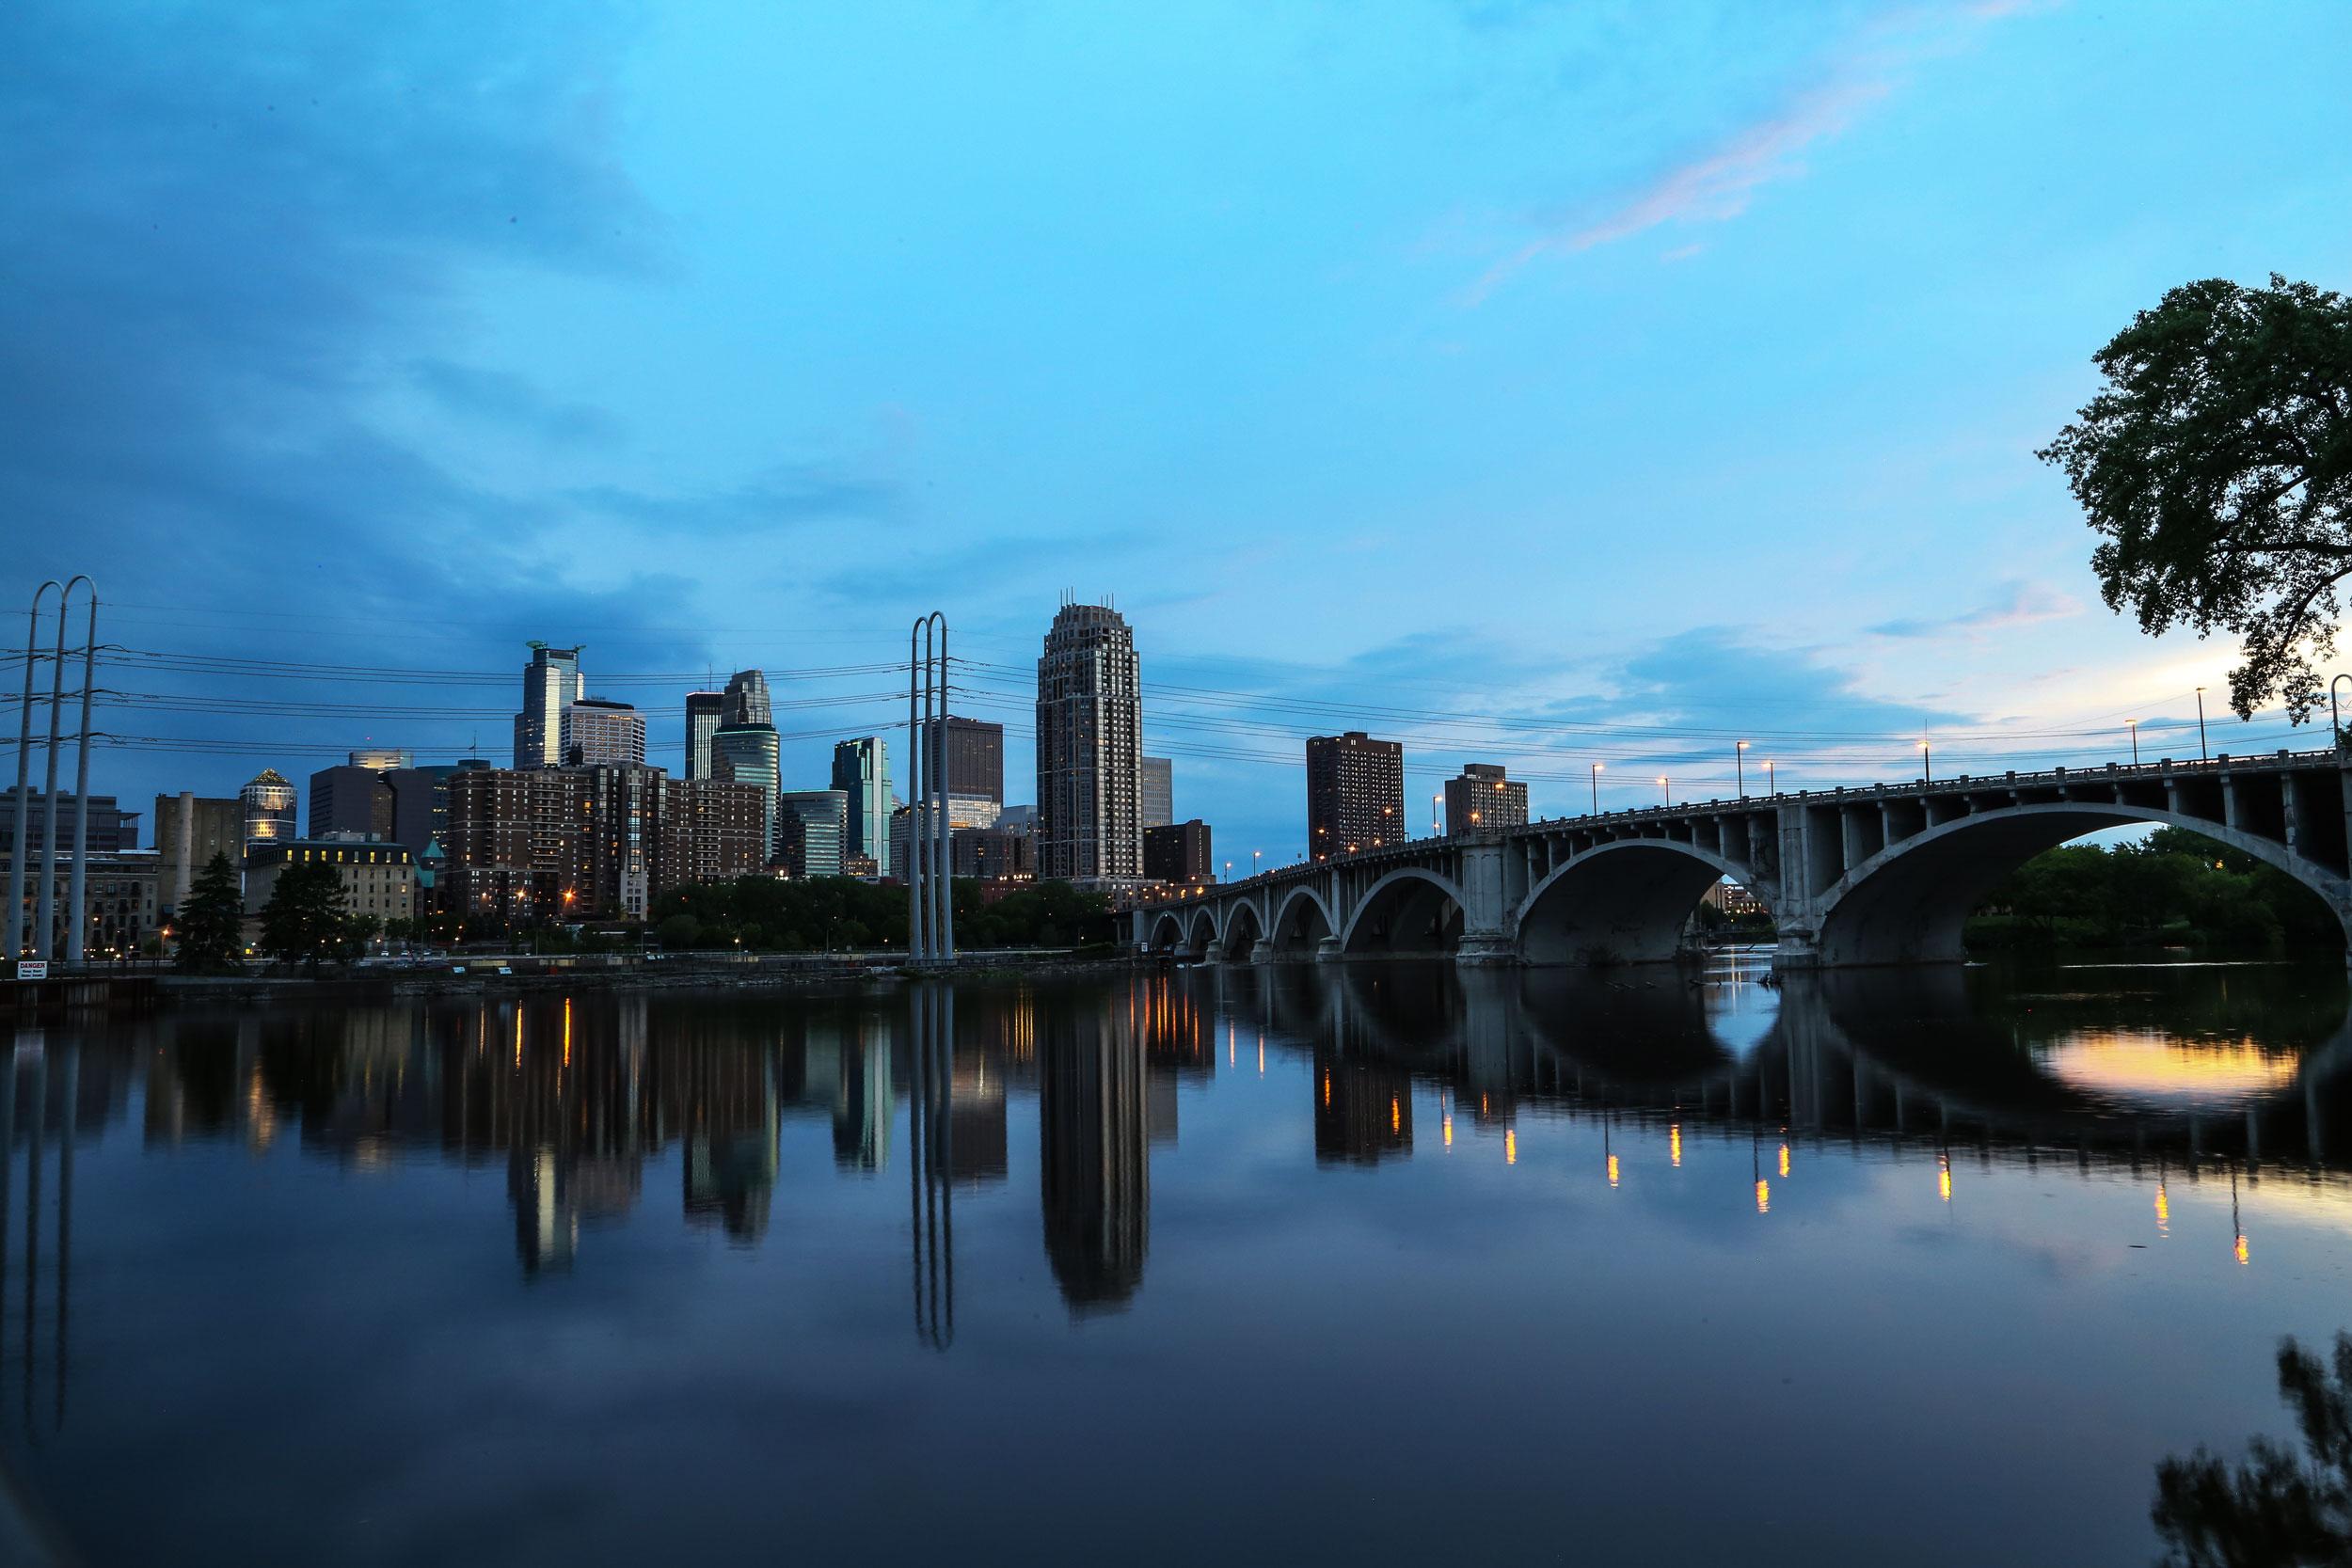 Urban-Mpls-river-dusk.jpg